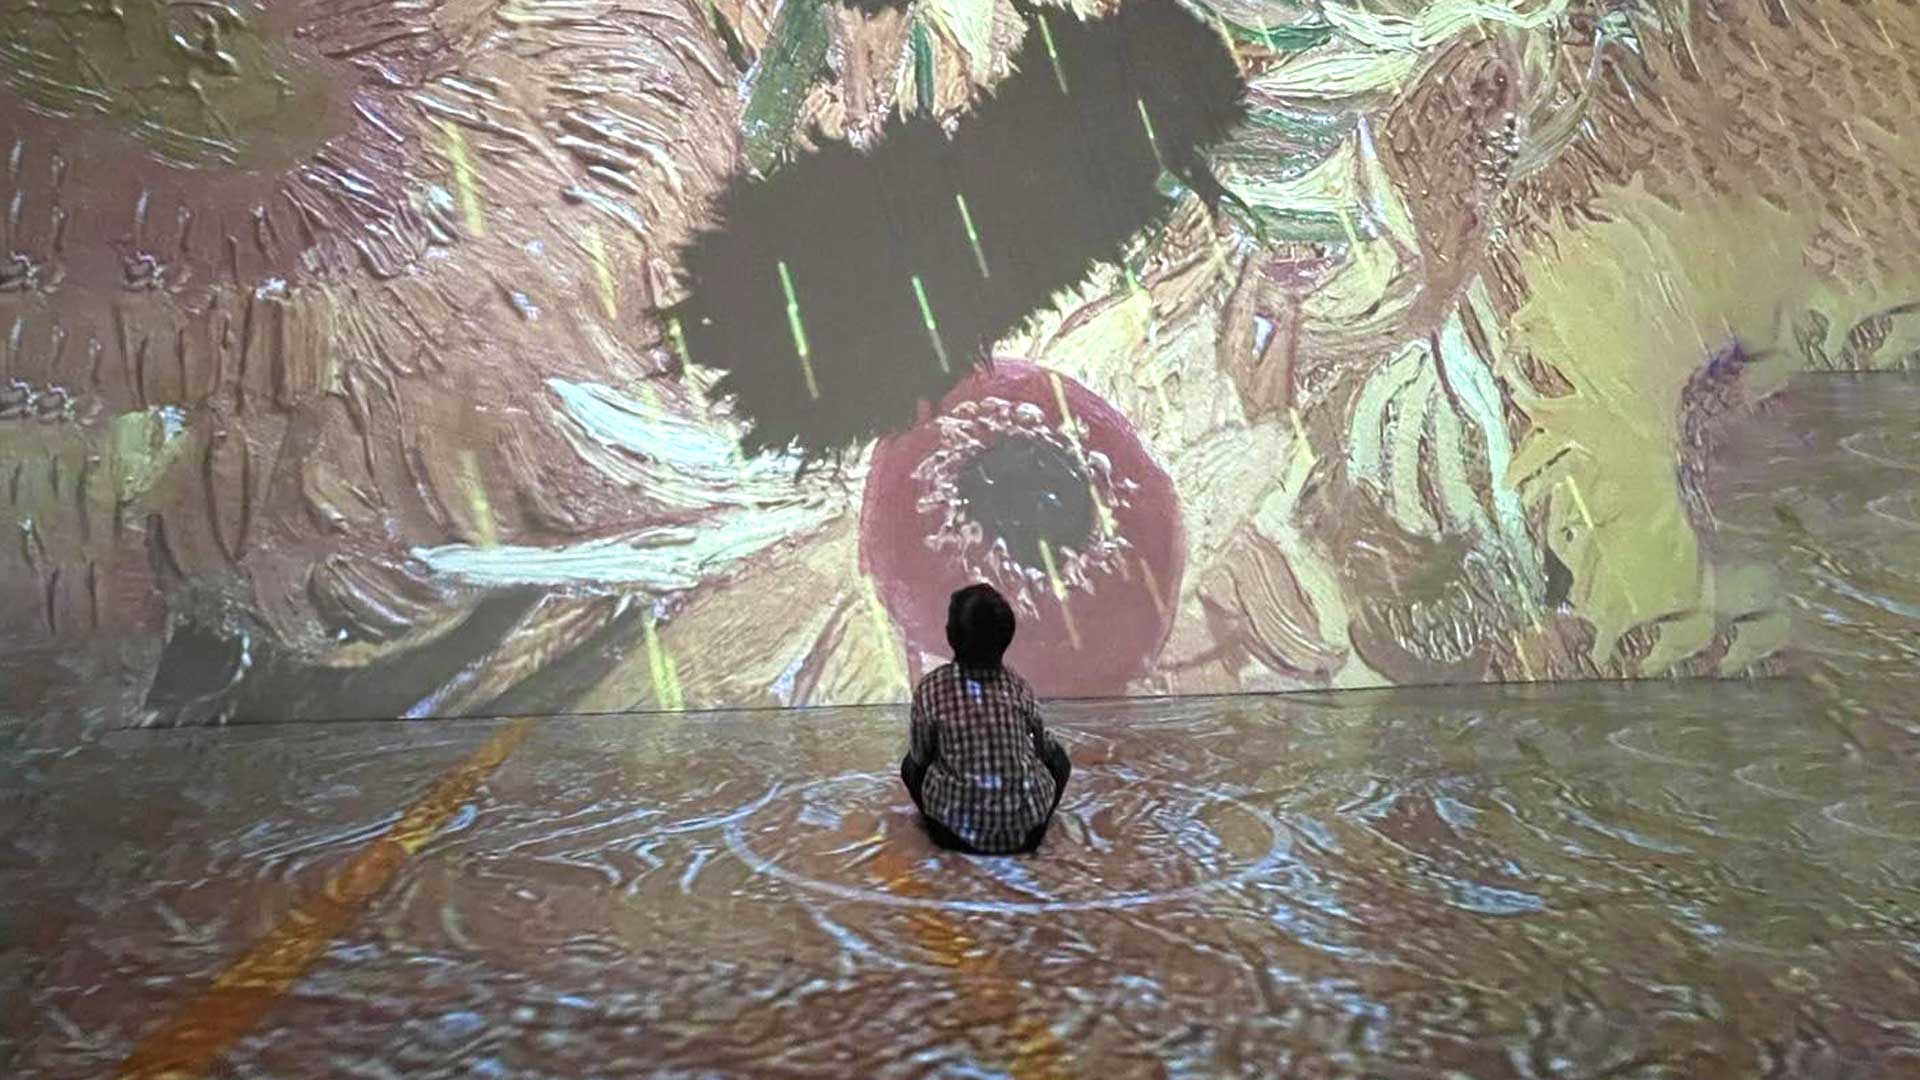 D takes in the Van Gogh light exhibit in Toronto